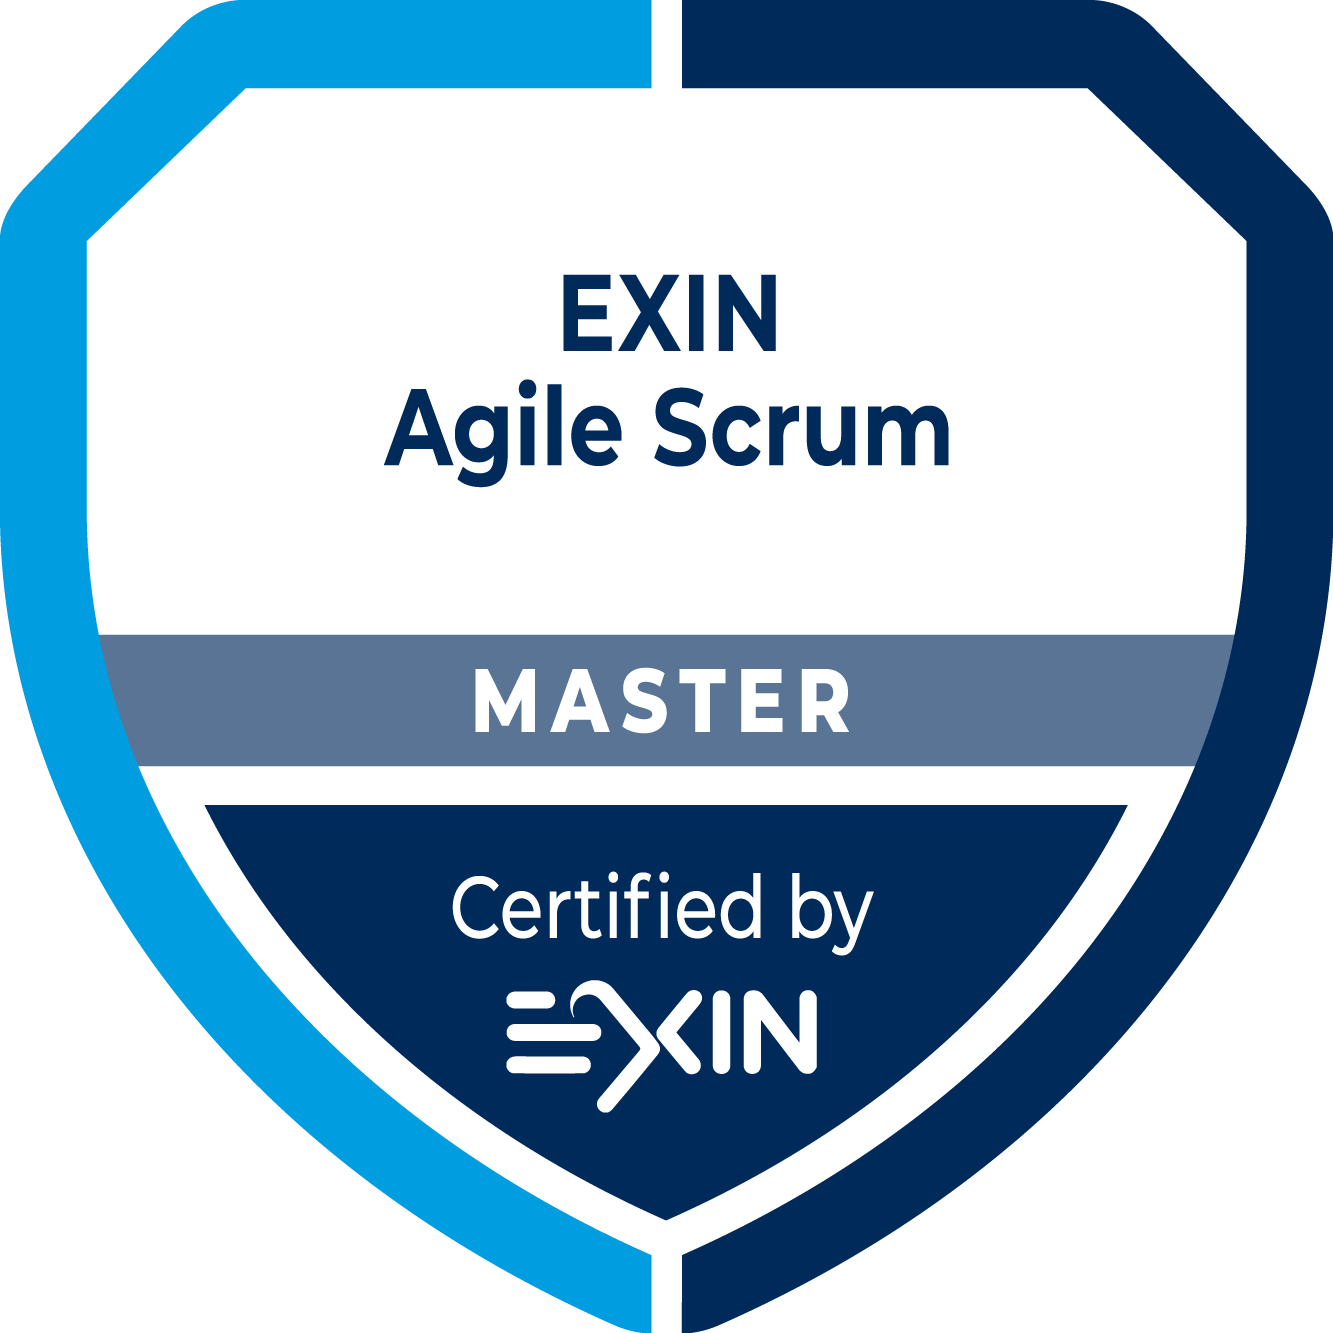 EXIN_Master_AgileScrum.png